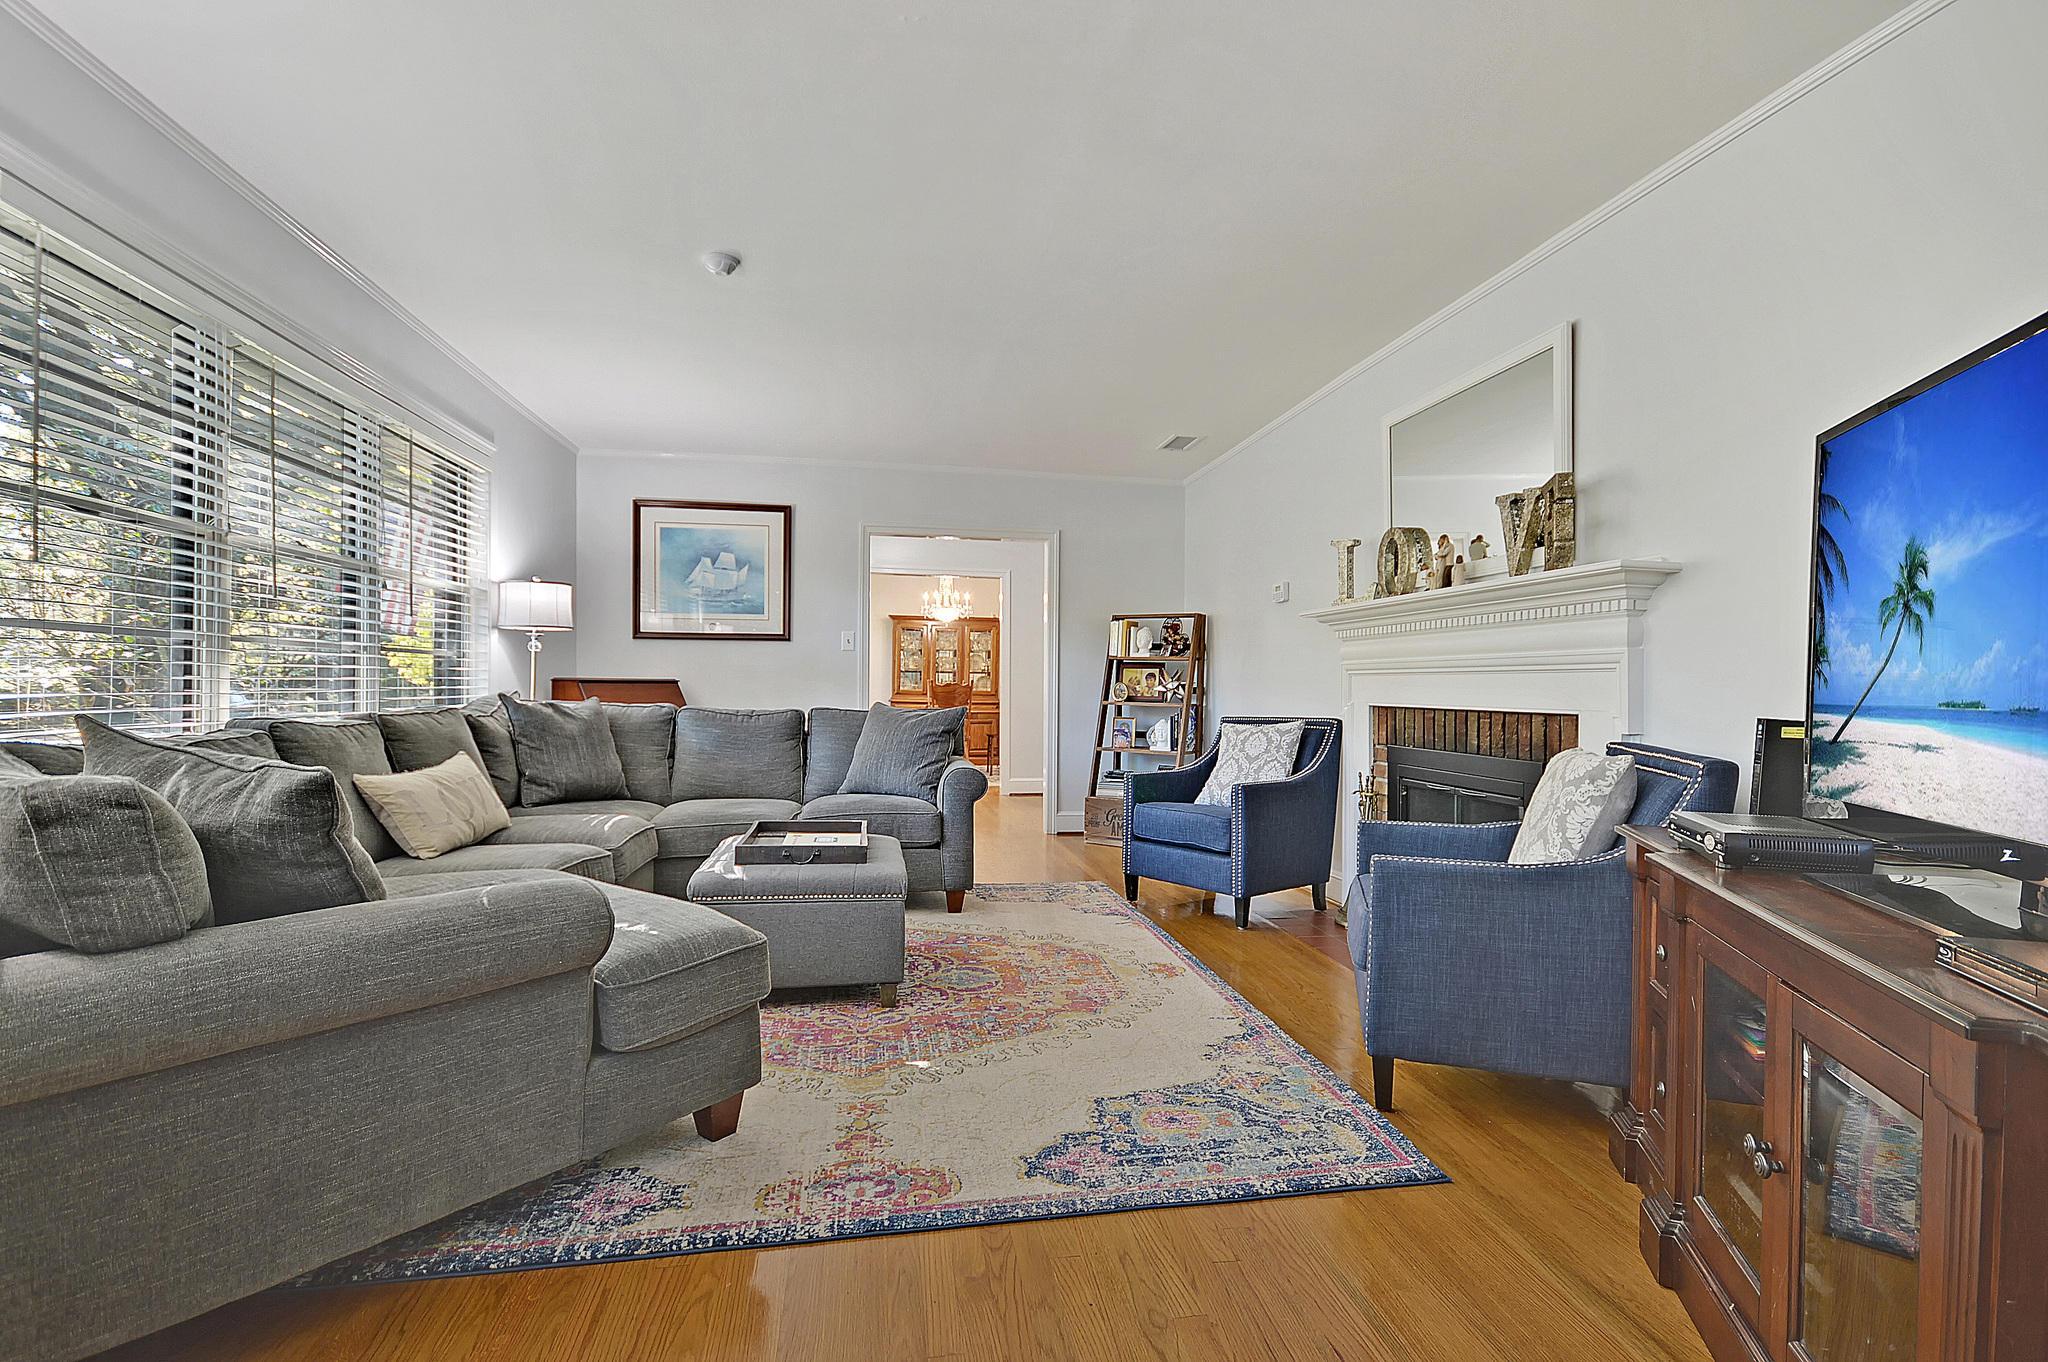 Edgewater Park Homes For Sale - 1356 Emory, Charleston, SC - 48